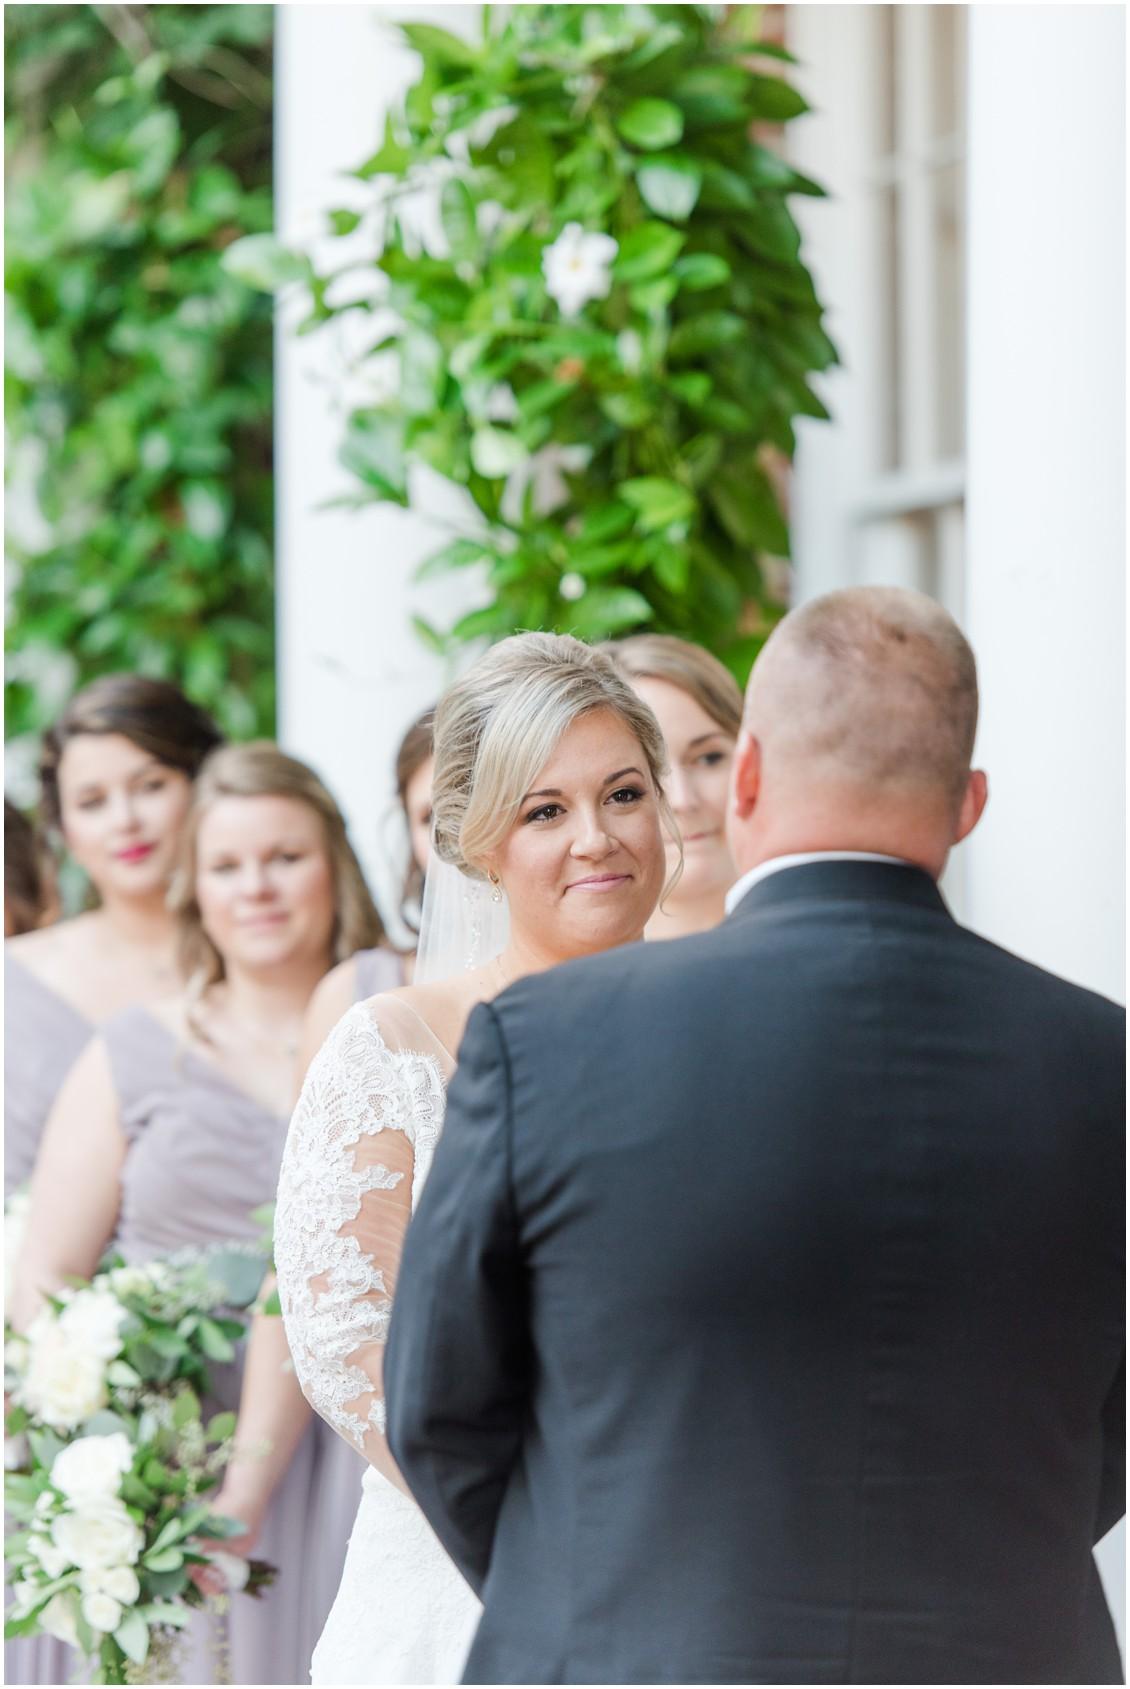 Bride looking at groom during wedding ceremony | My Eastern Shore Wedding | The Tidewater Inn